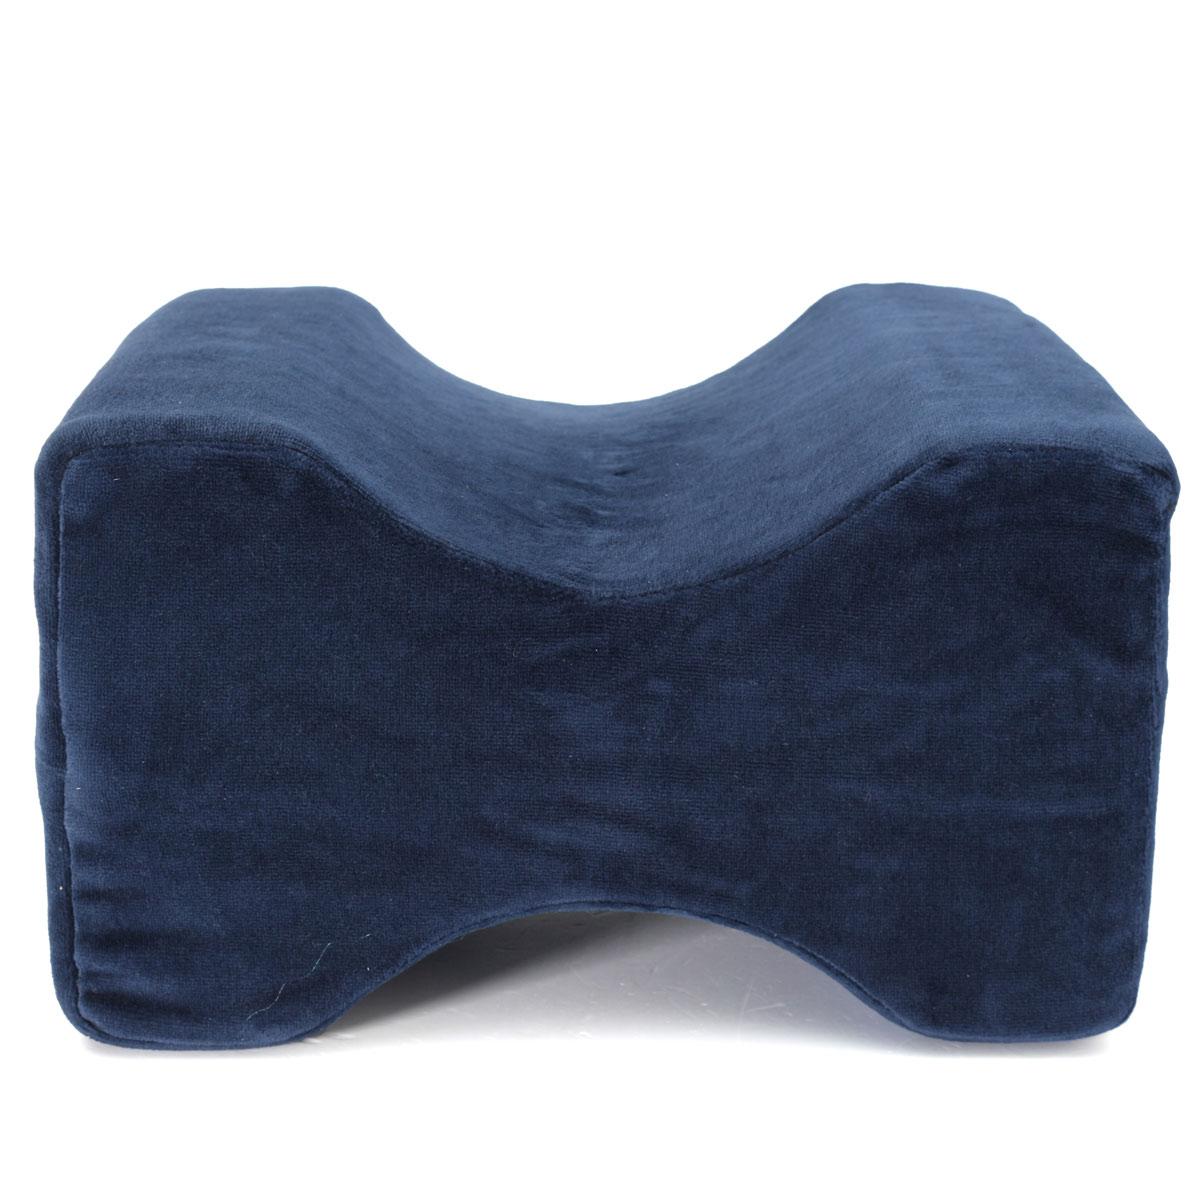 Memory Foam Knee Leg Pillow Bed Cushion Wedge Pressure